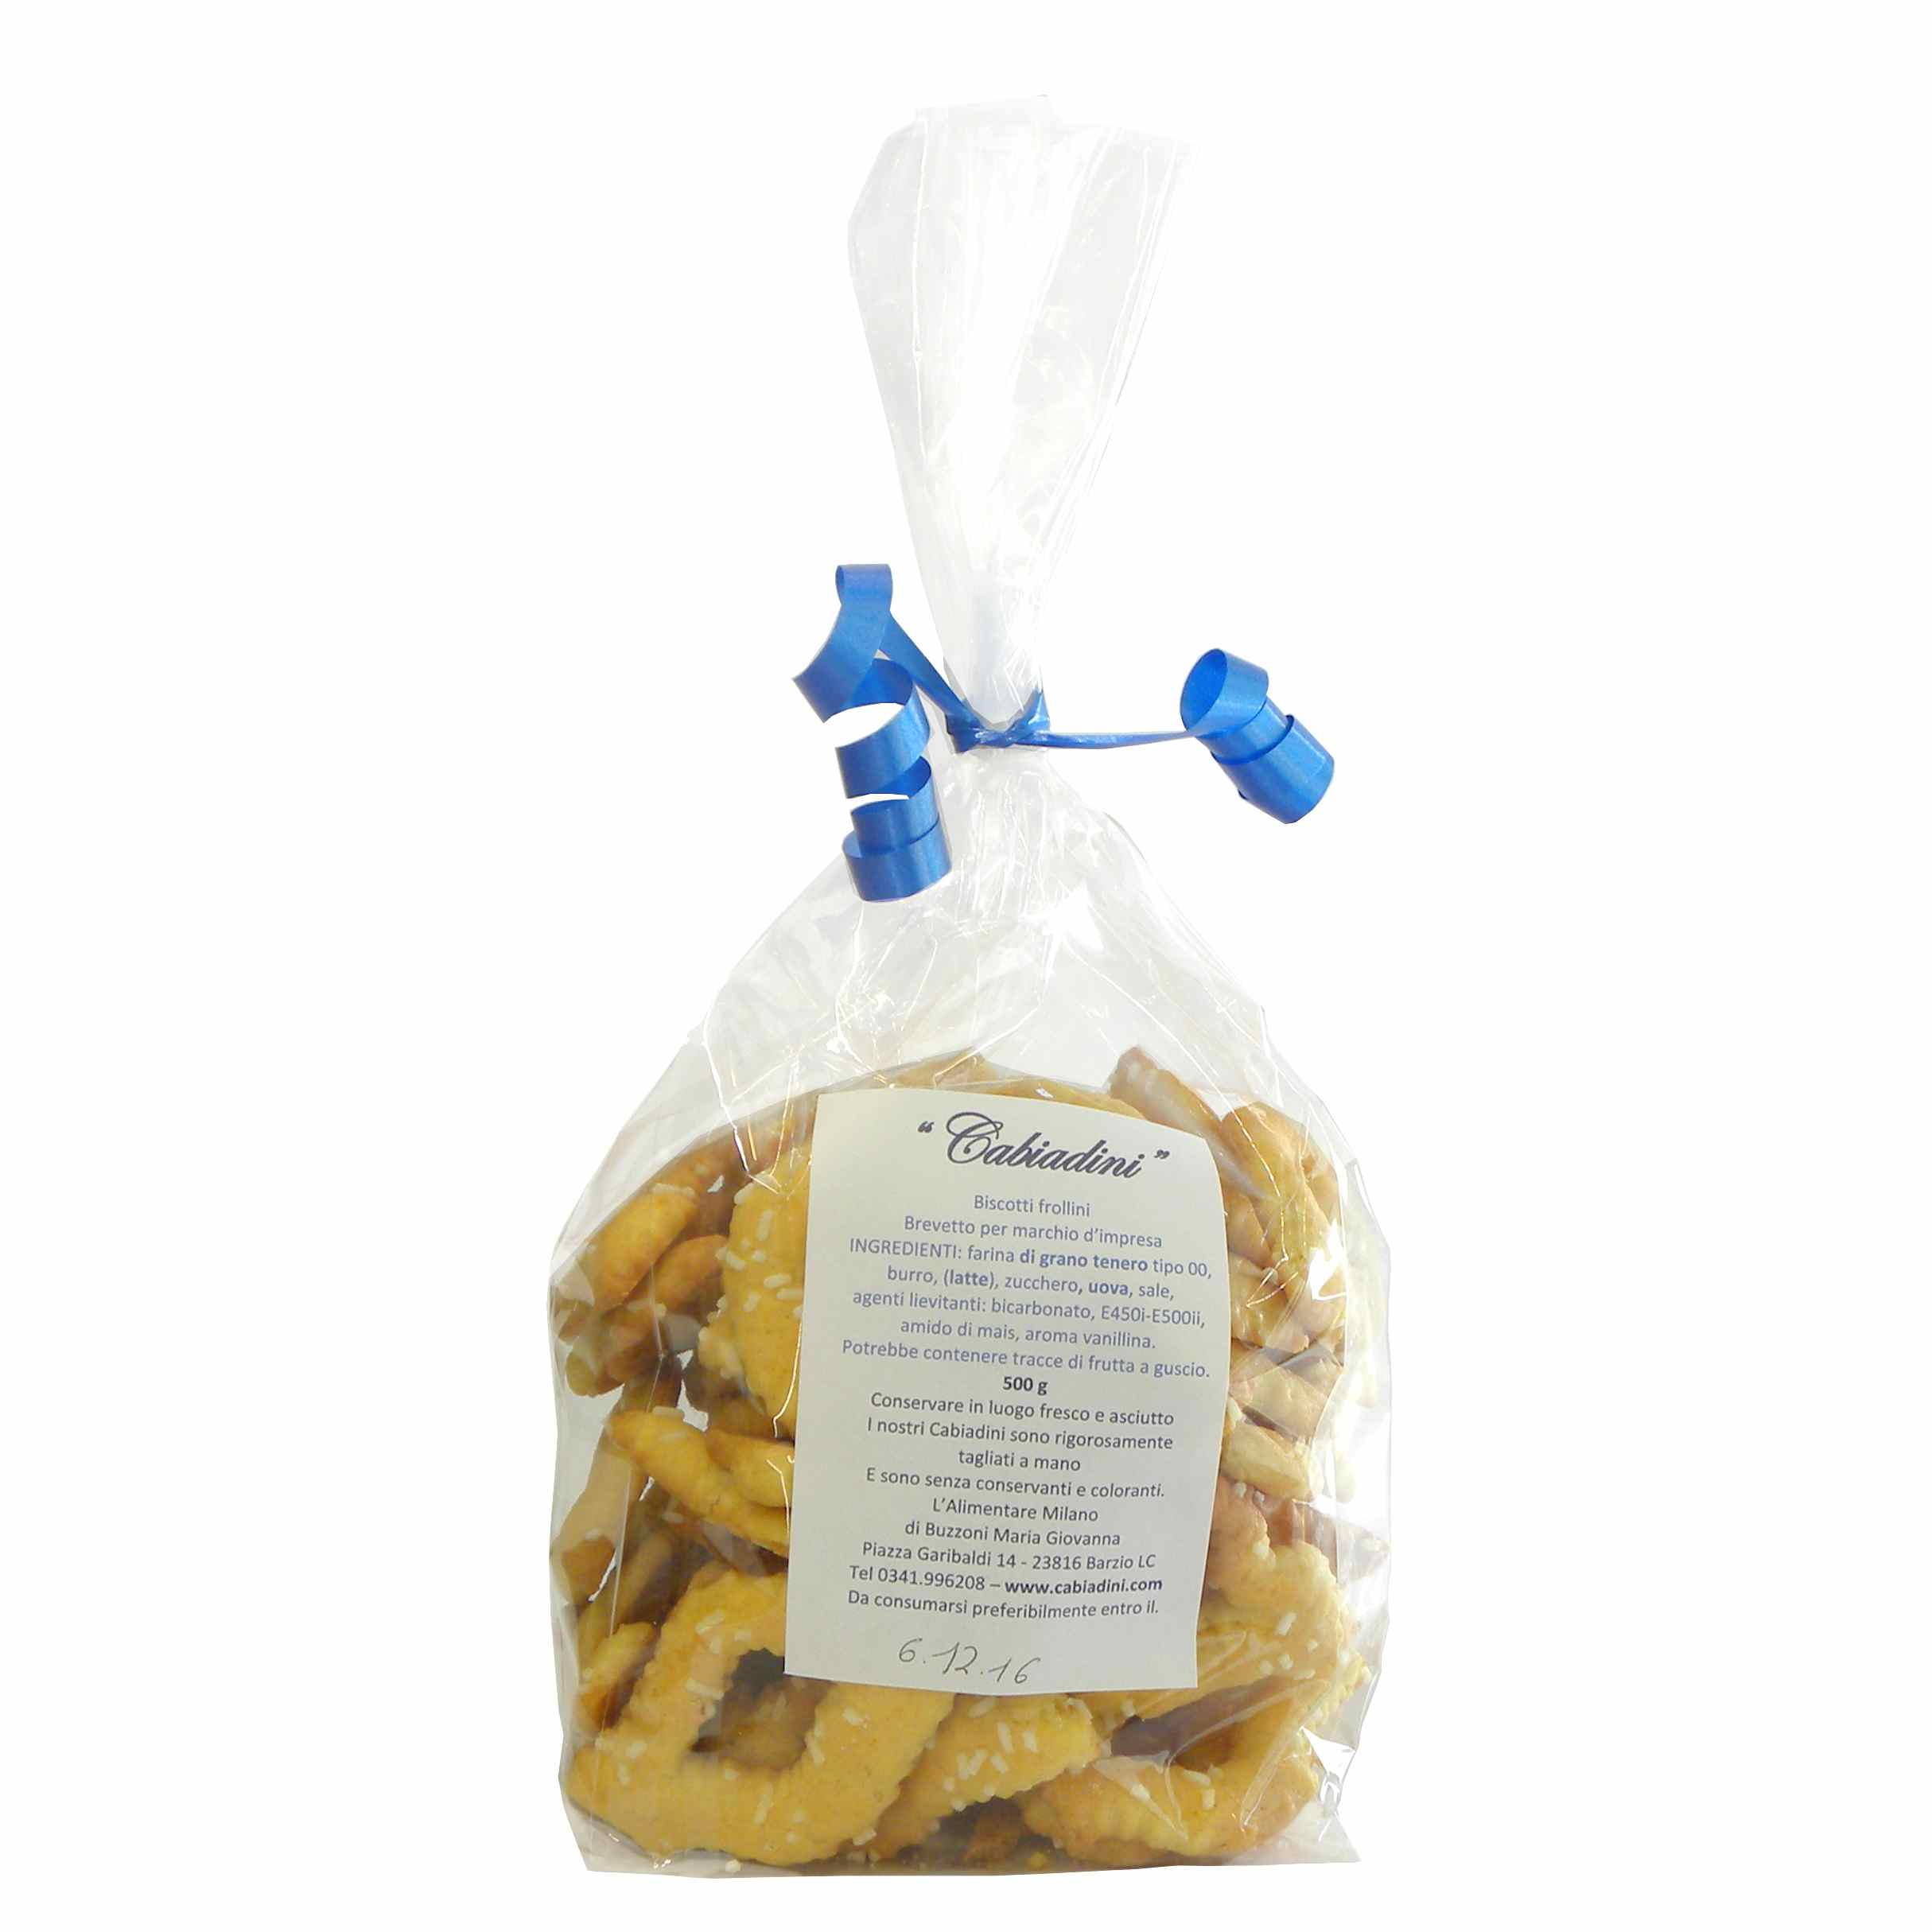 Cabiadini Biscotti – Cabiadini cookies – Gustorotondo – Italian food boutique